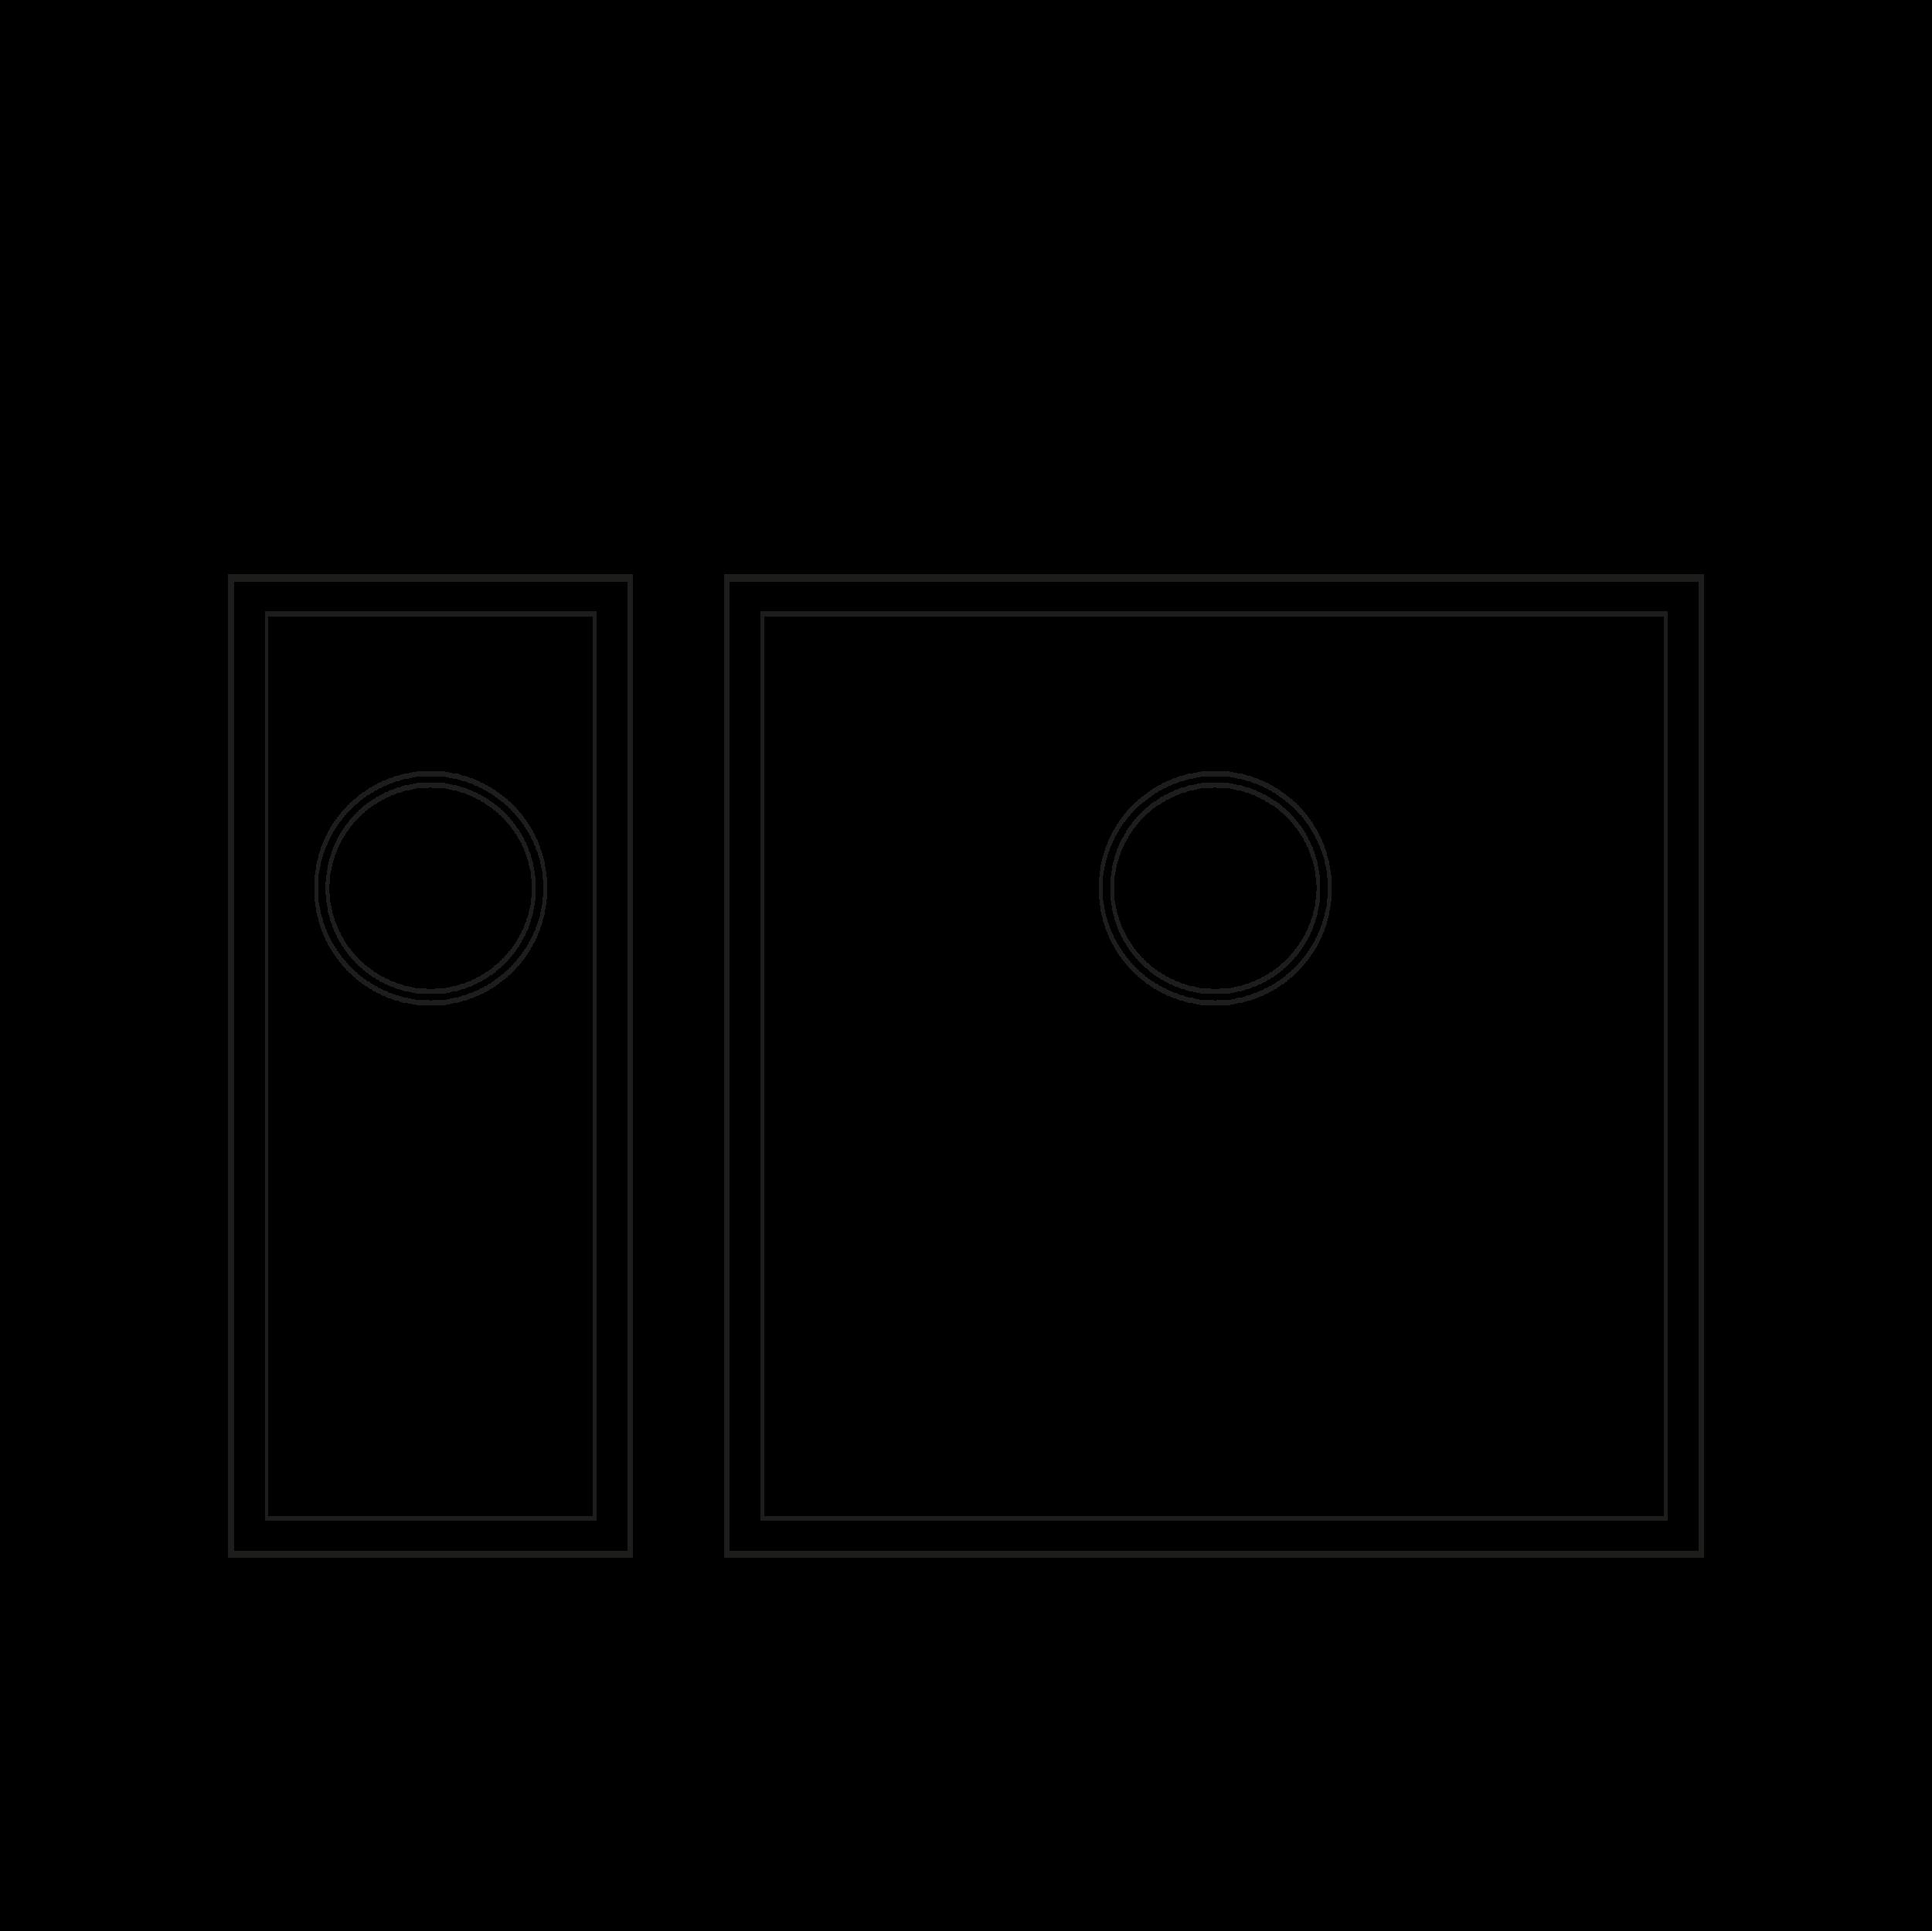 800mm Cabinet Sink Combination - 1.5 sink combinationHalf Sink: TS175Sink: TS425